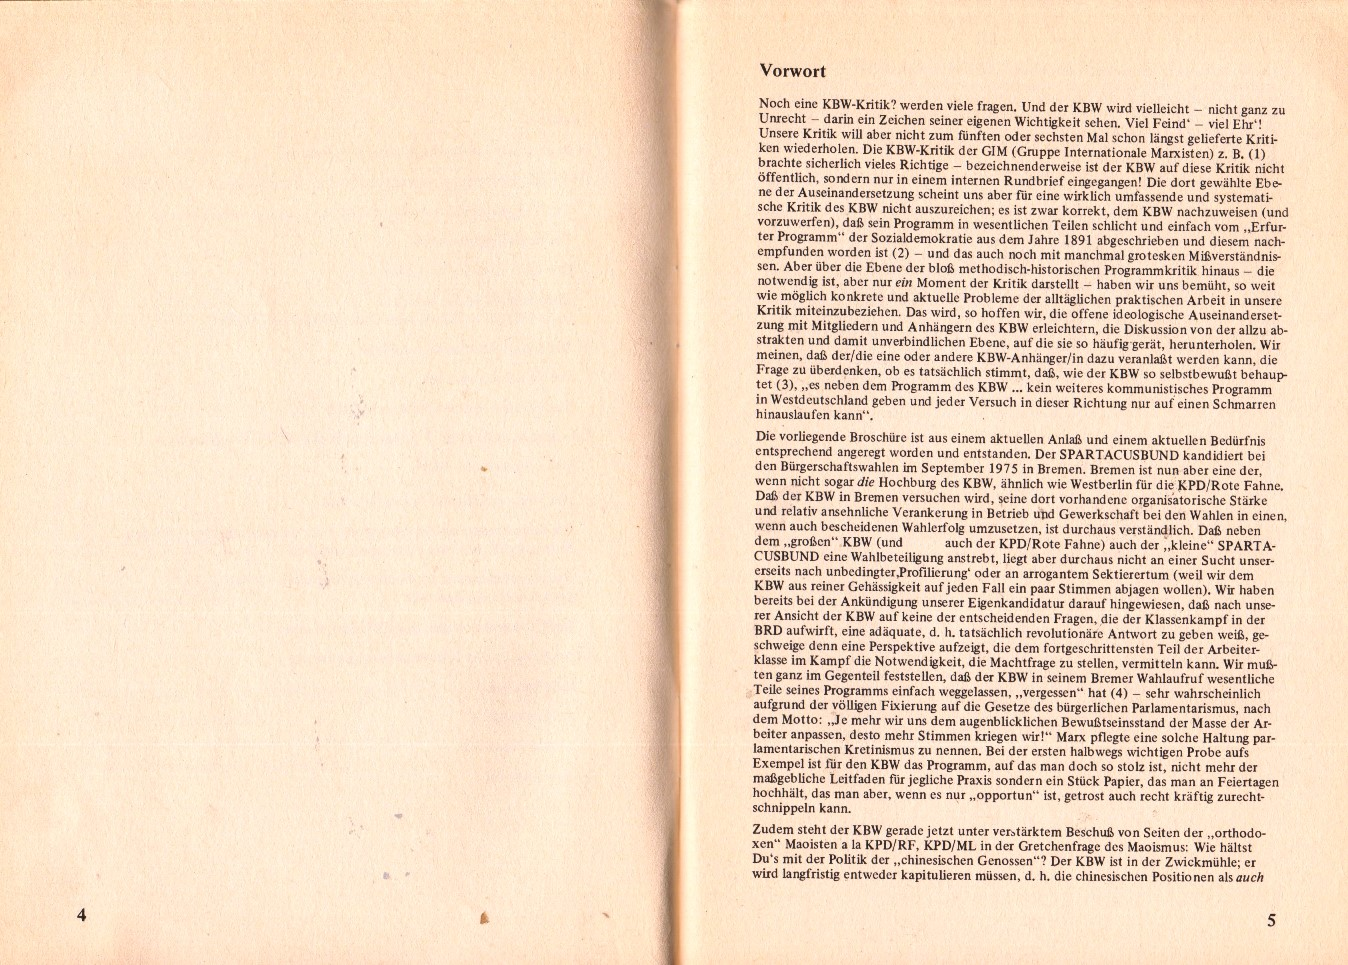 Spartacus_1975_Kritik_des_KBW_04